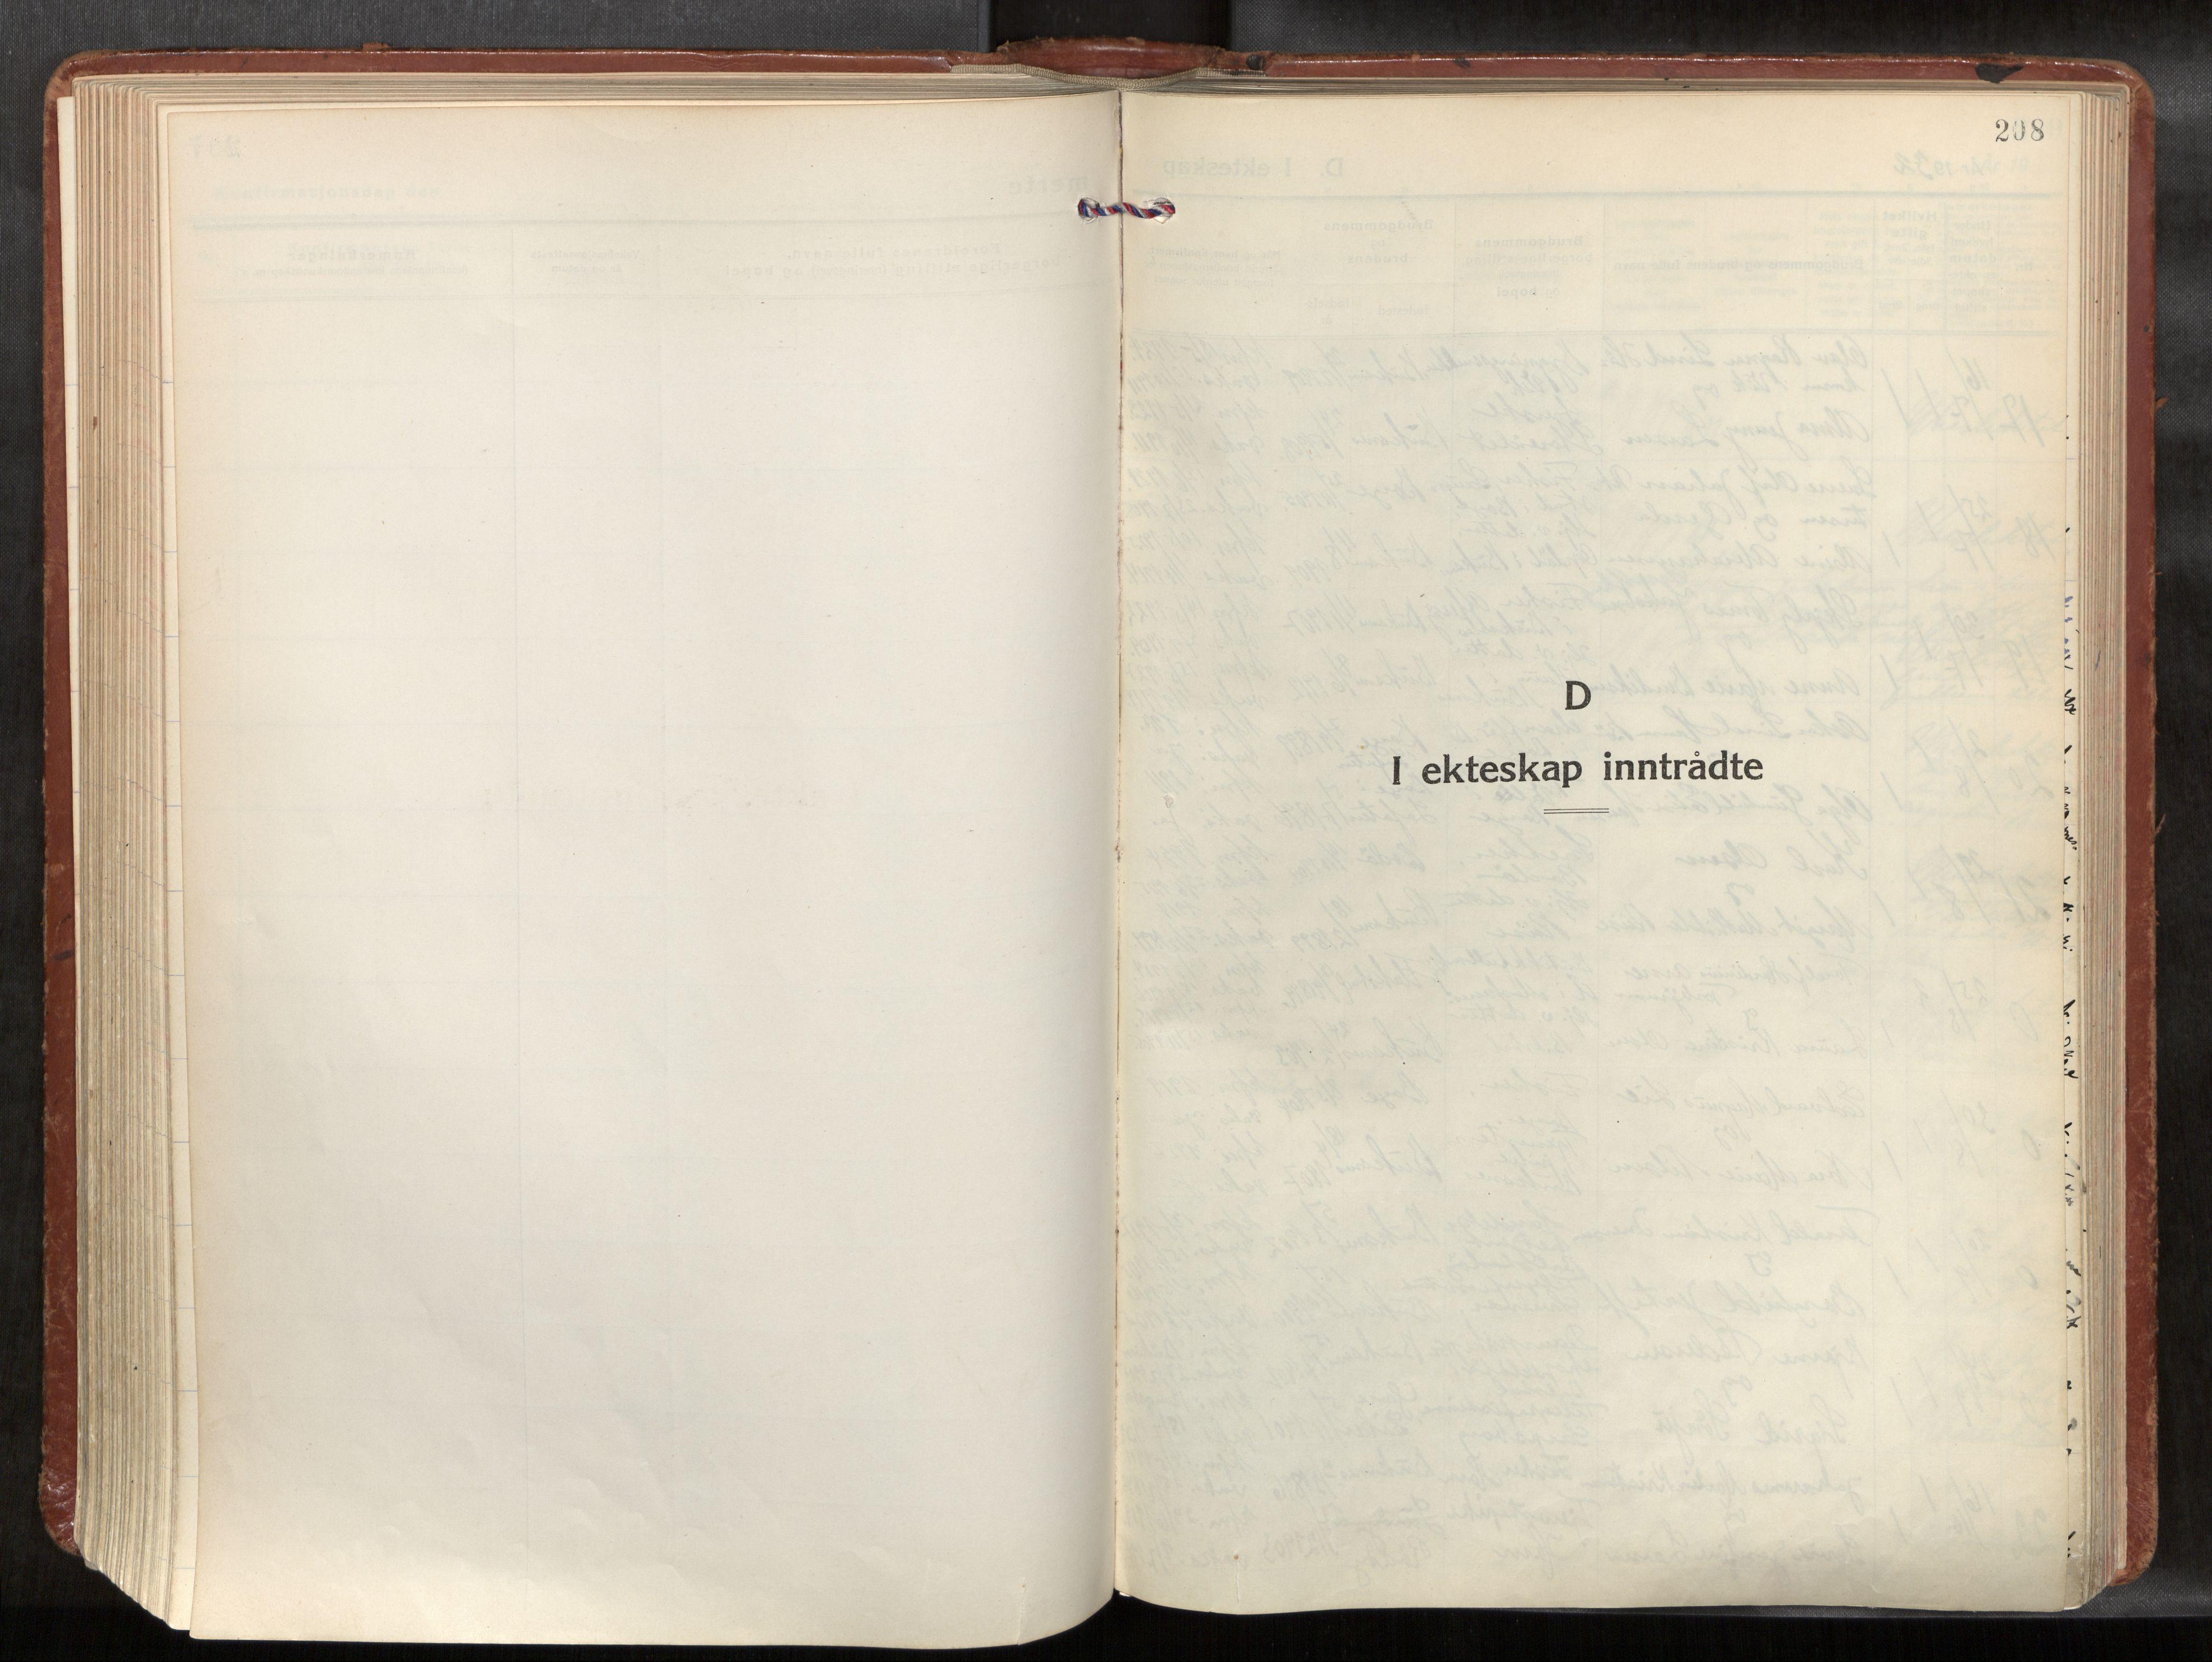 SAT, Ministerialprotokoller, klokkerbøker og fødselsregistre - Nordland, 881/L1161: Ministerialbok nr. 881A14, 1932-1955, s. 208